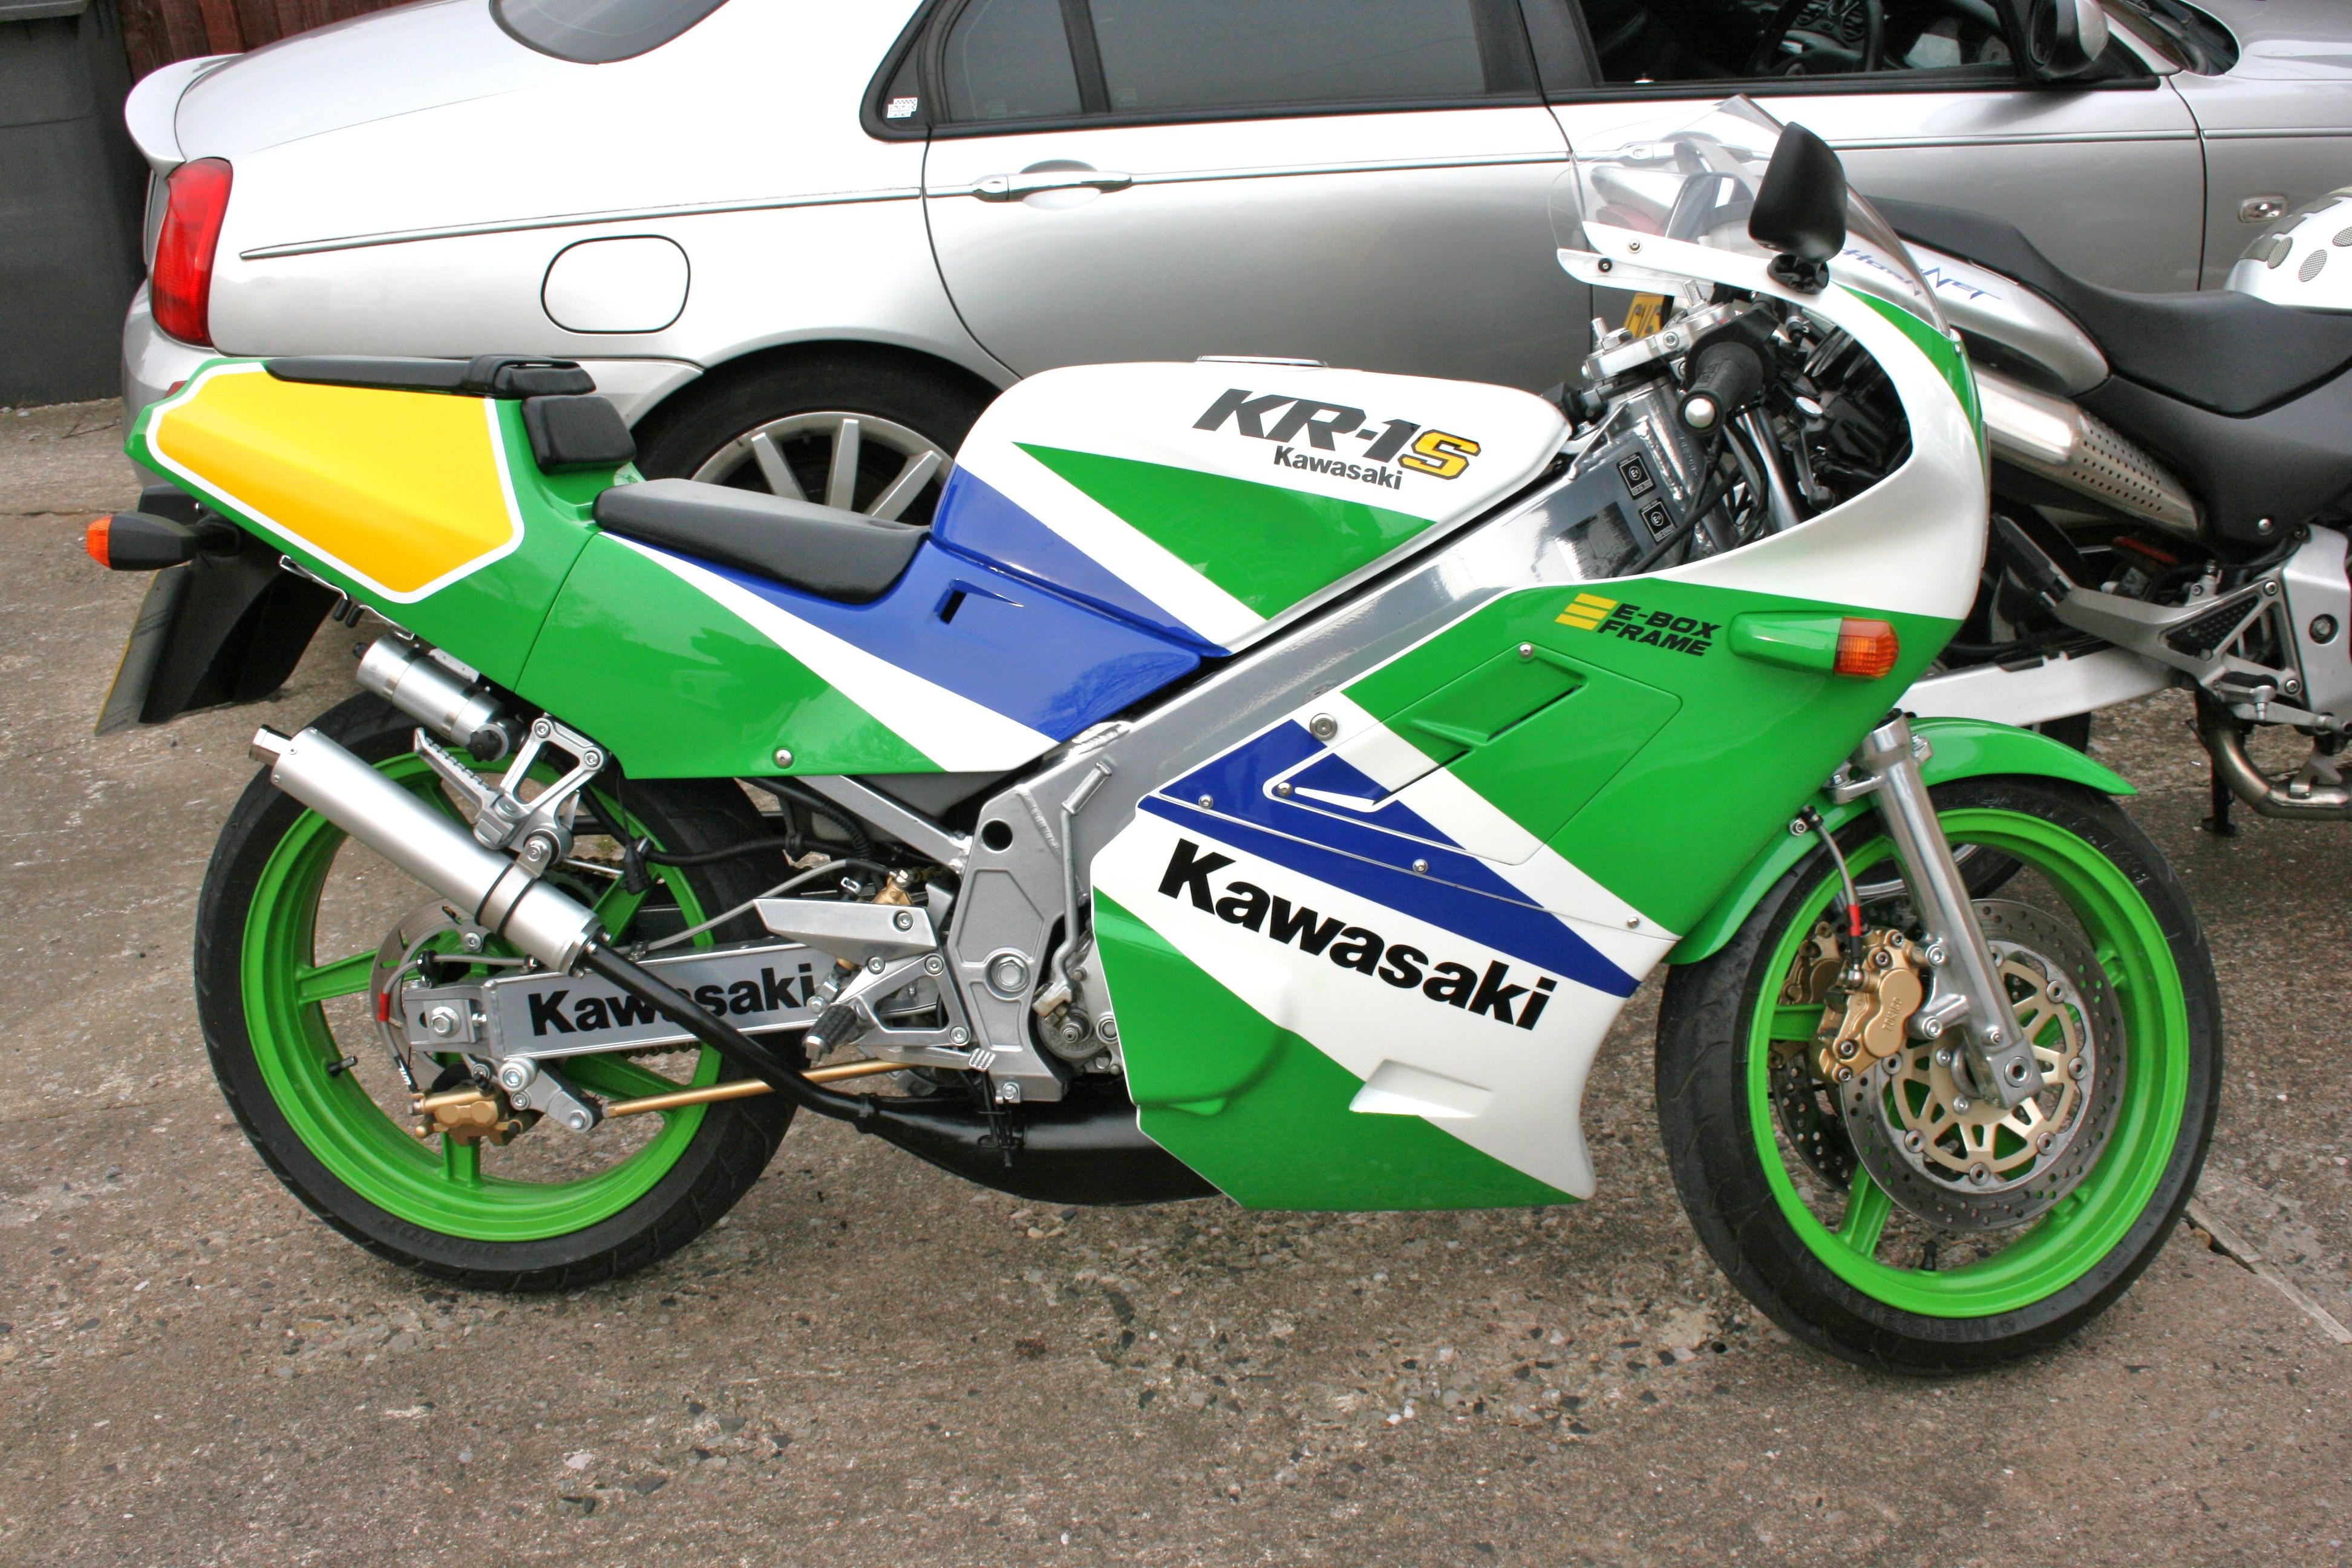 Genuine Kawasaki KR1 o KR1-S rodamientos de rueda trasera 1989-1992